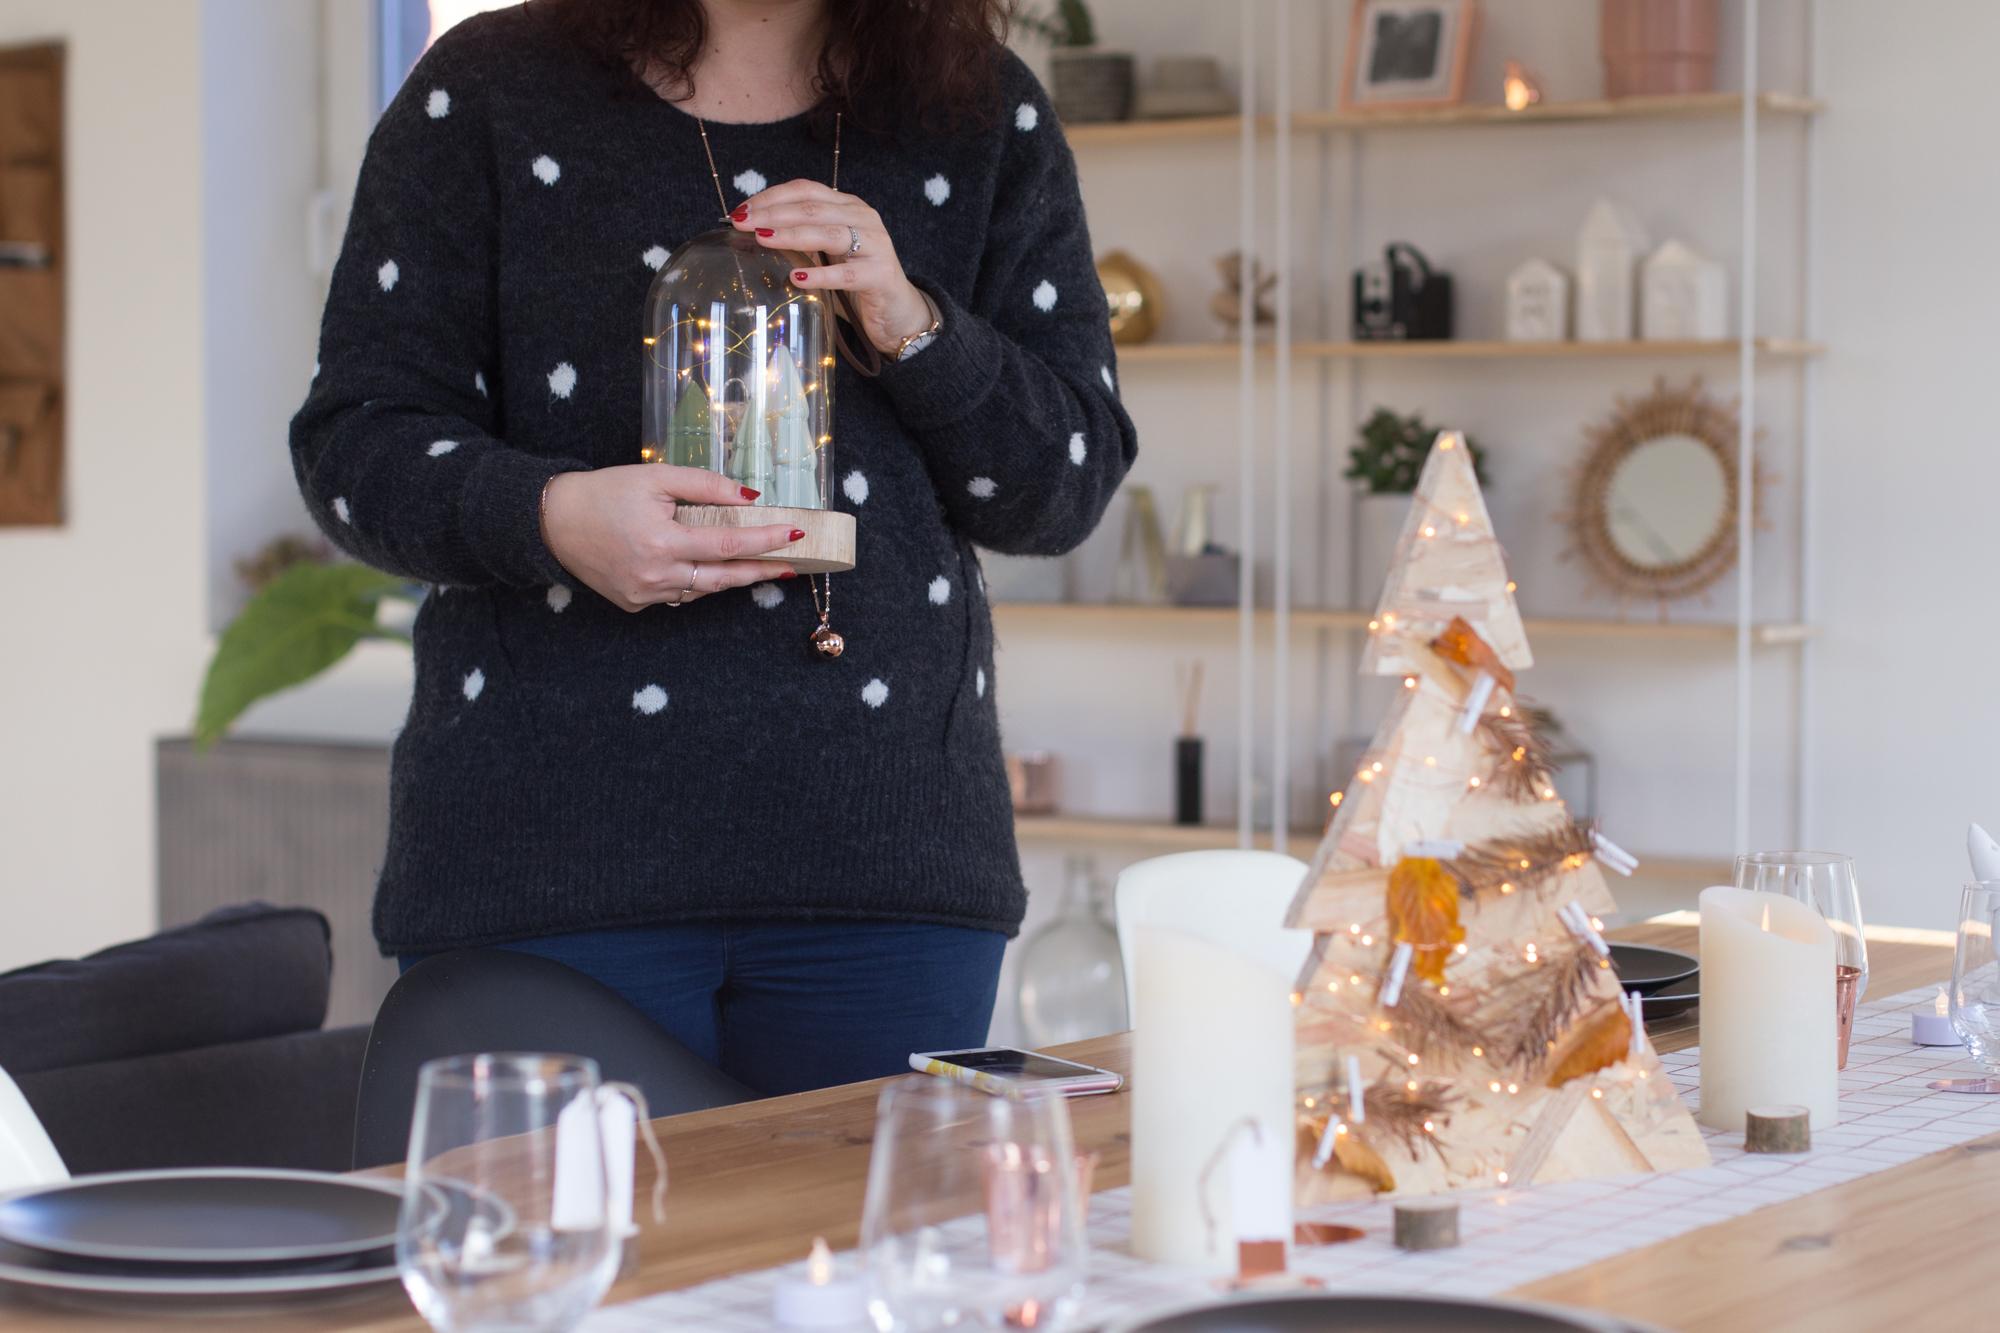 mint & paper deco blog cloche en verre décoration de noel table guirlande lumineuse